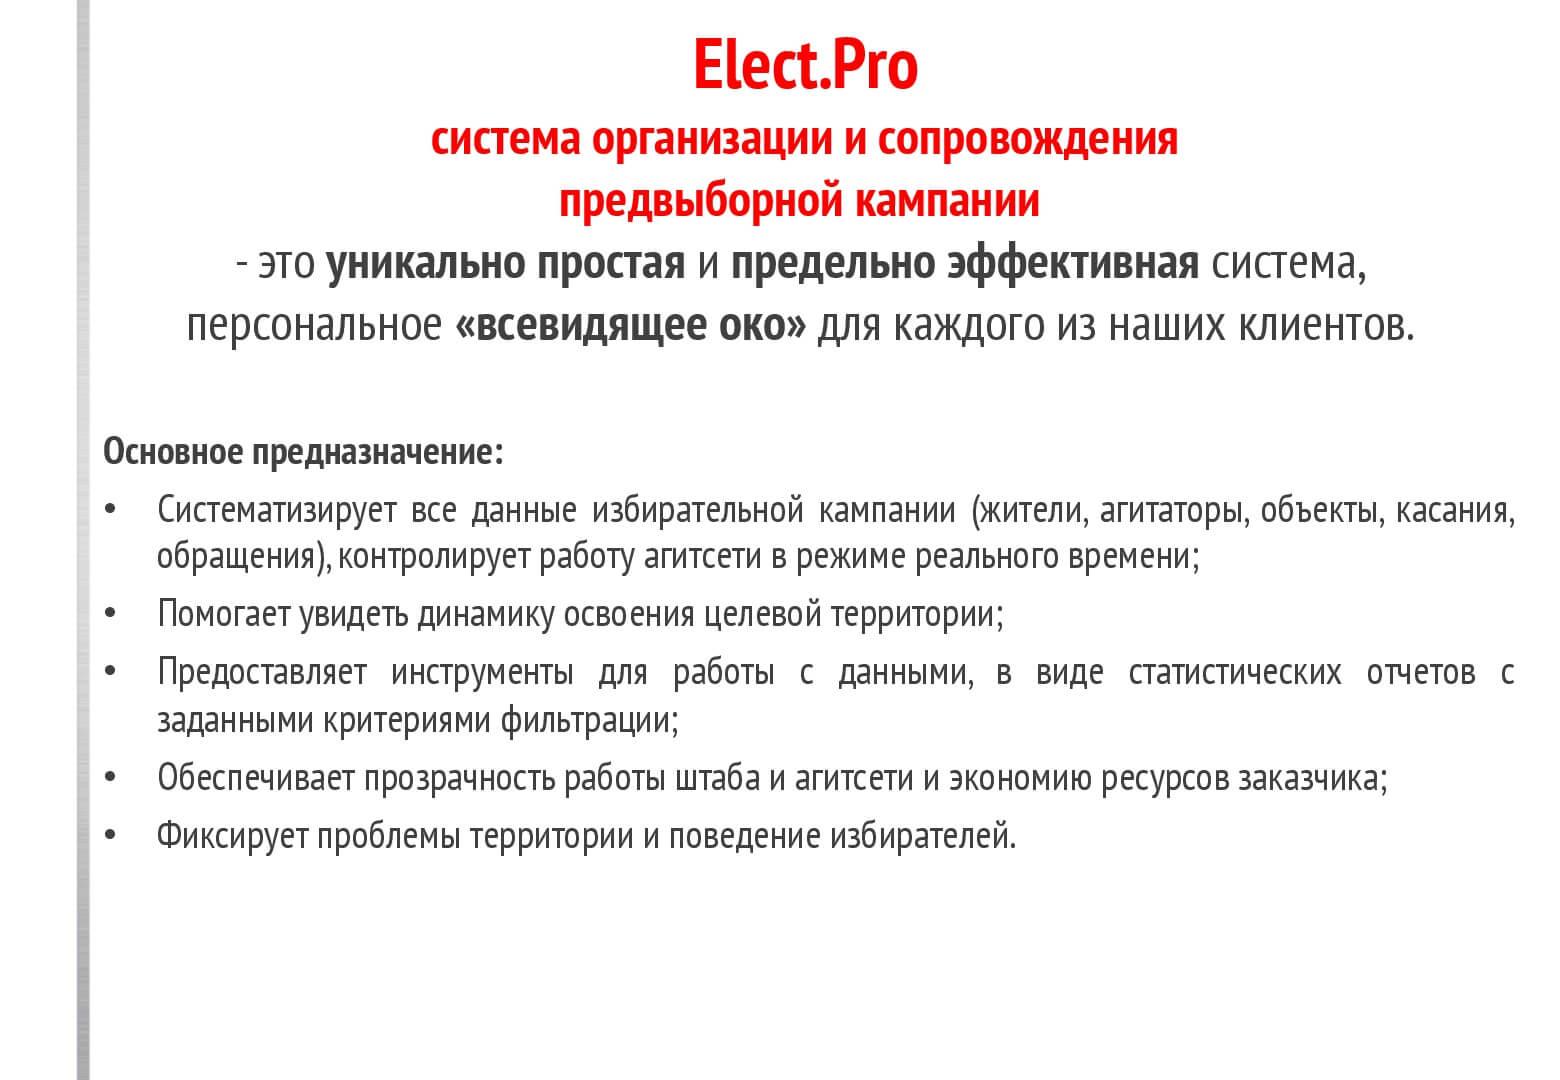 Elect.pro-BG-UA-002